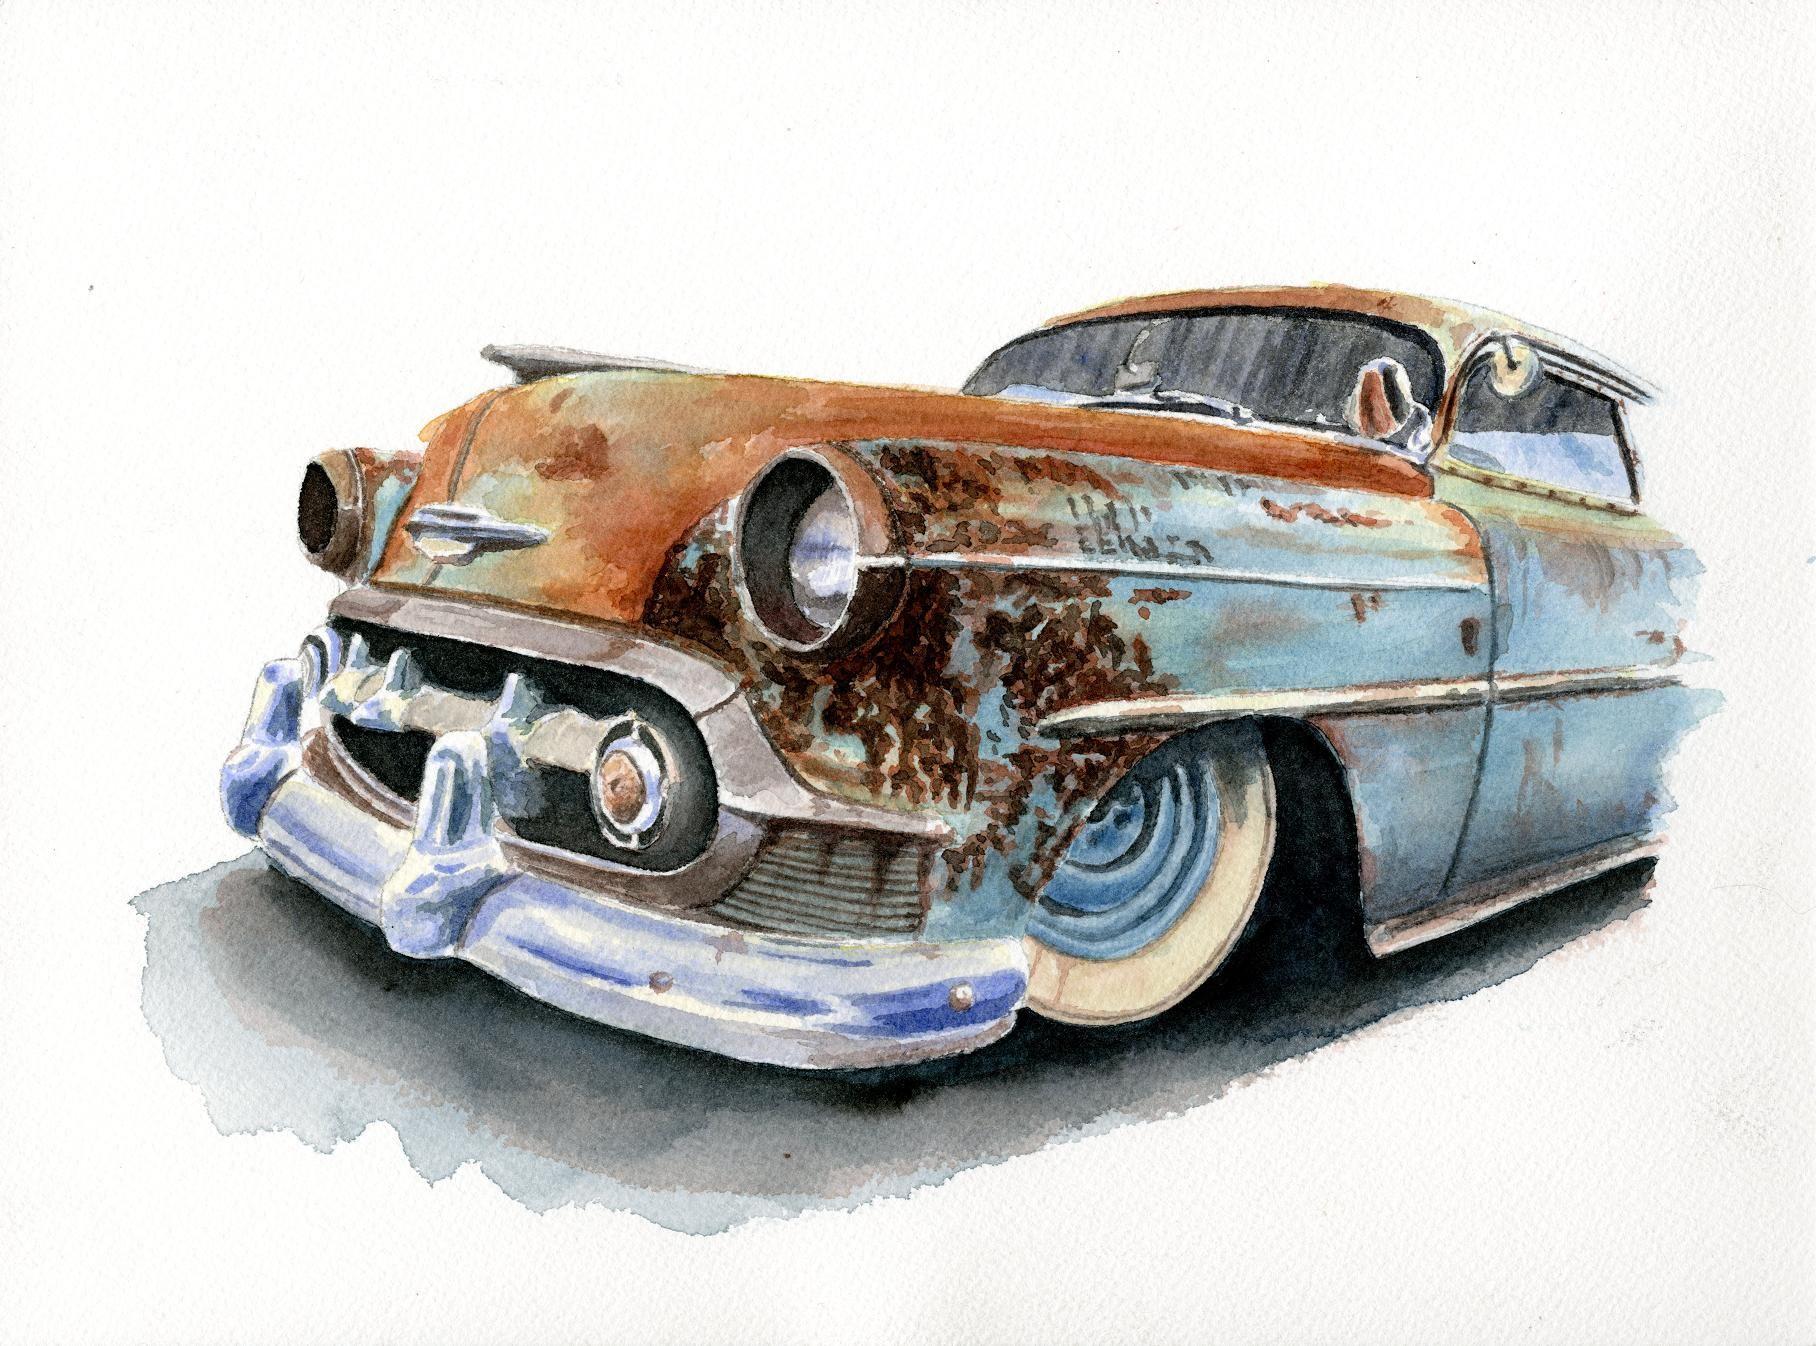 Rusty Chevy inspires!